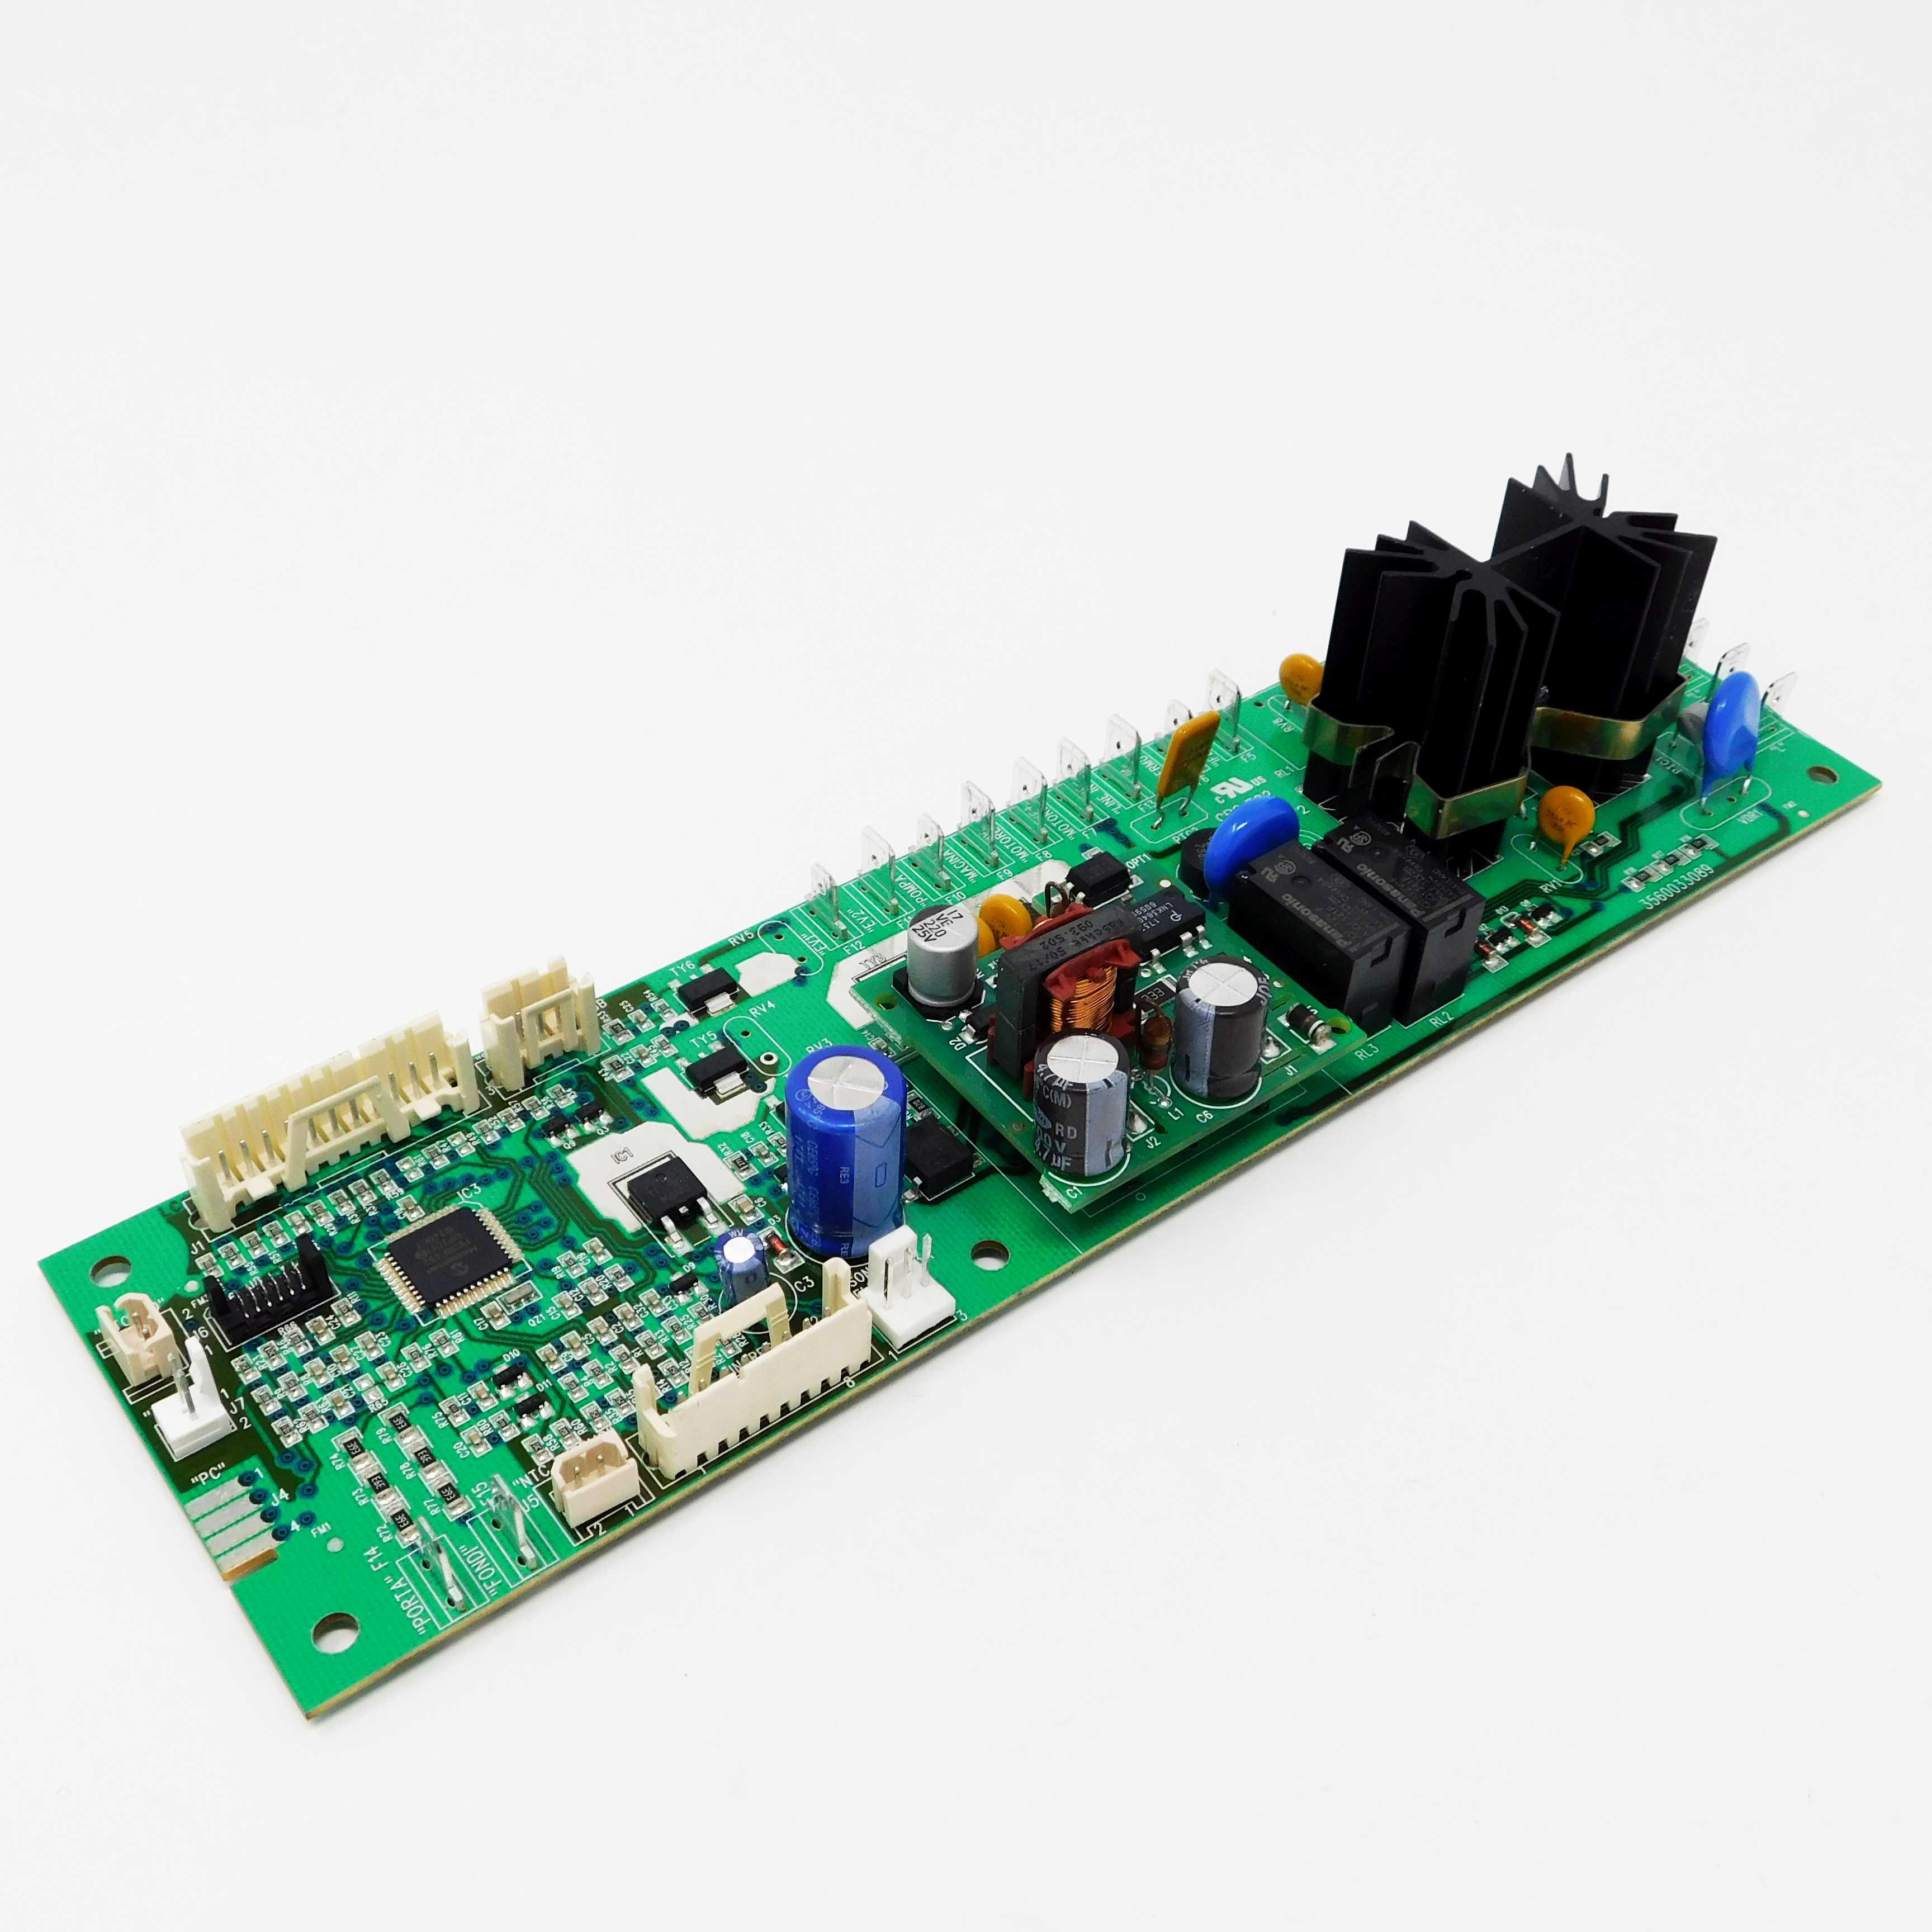 Delonghi Steuerplatine Platine Elektronik EAM ESAM 2* 3* 4* Magnifica ==/> Liste